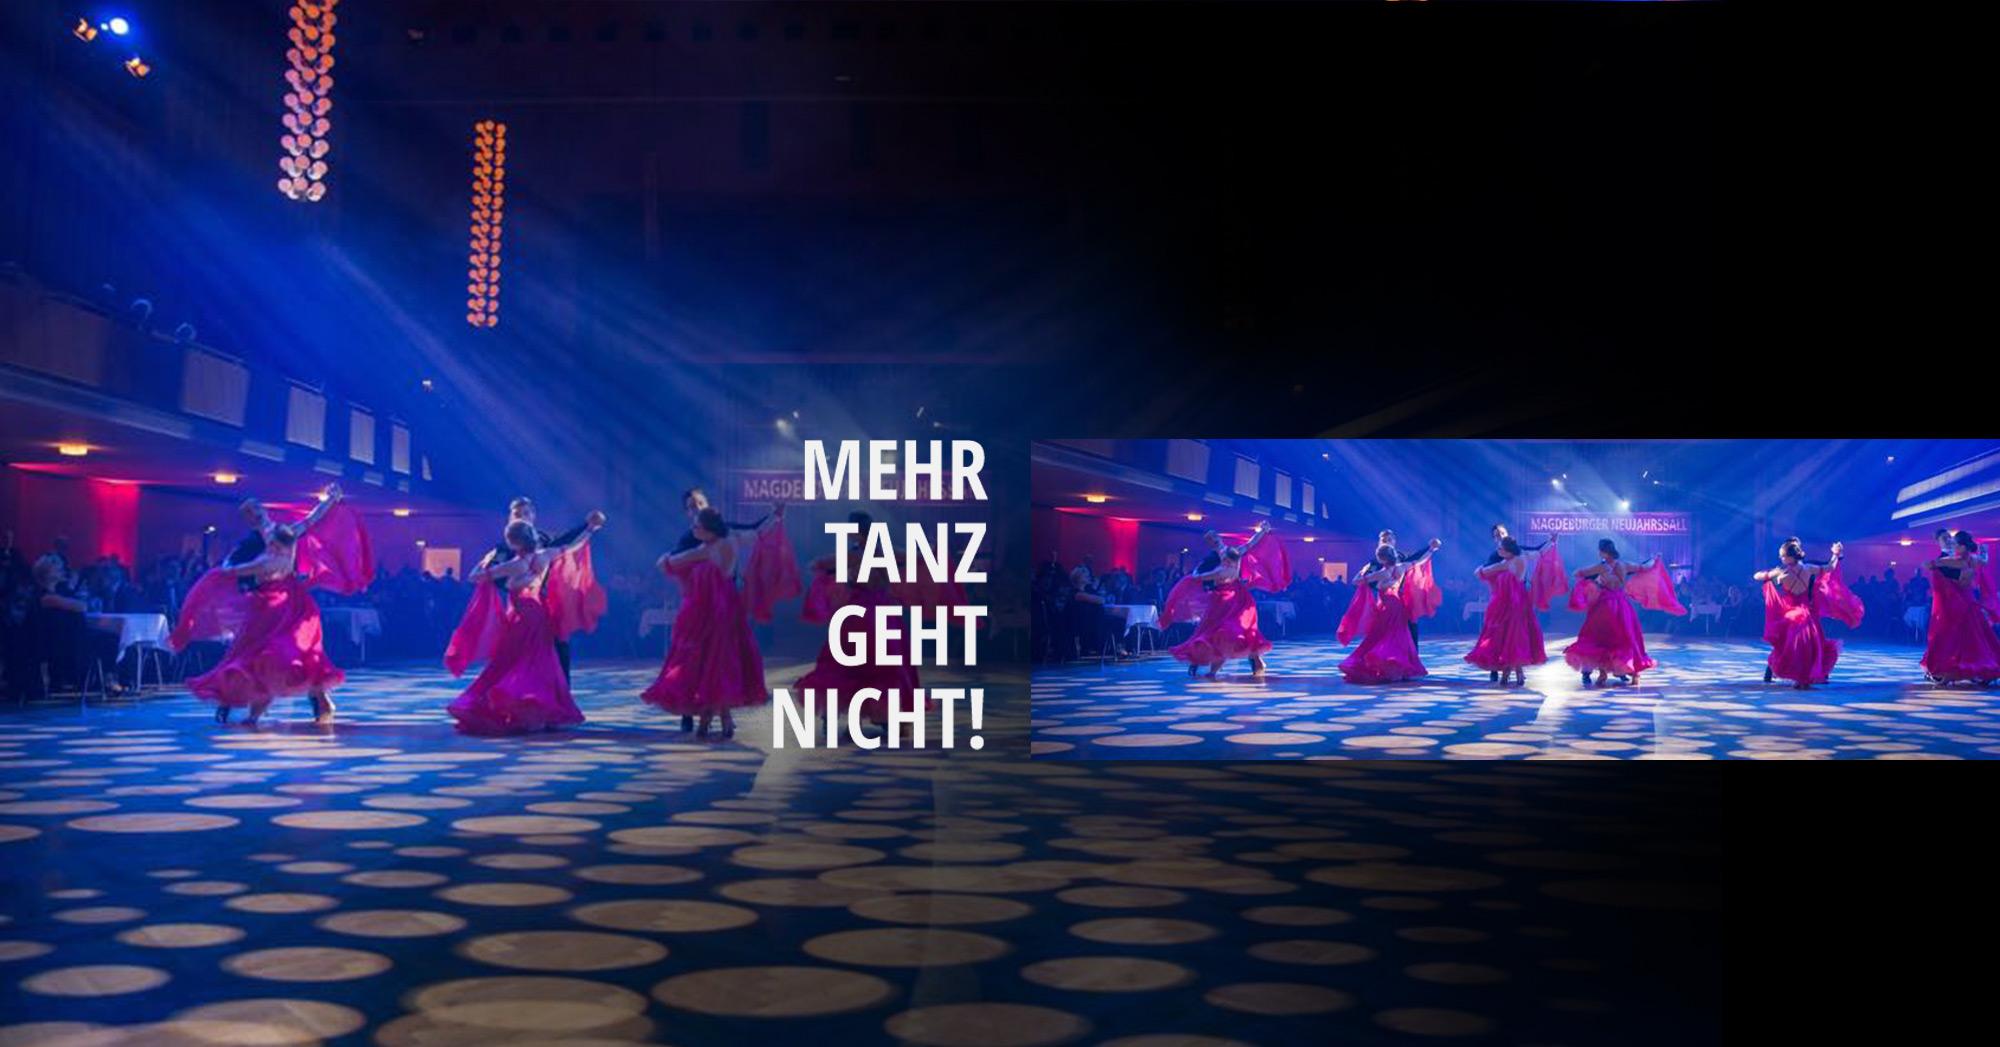 all became frau sucht mann lüdenscheid congratulate, what necessary words